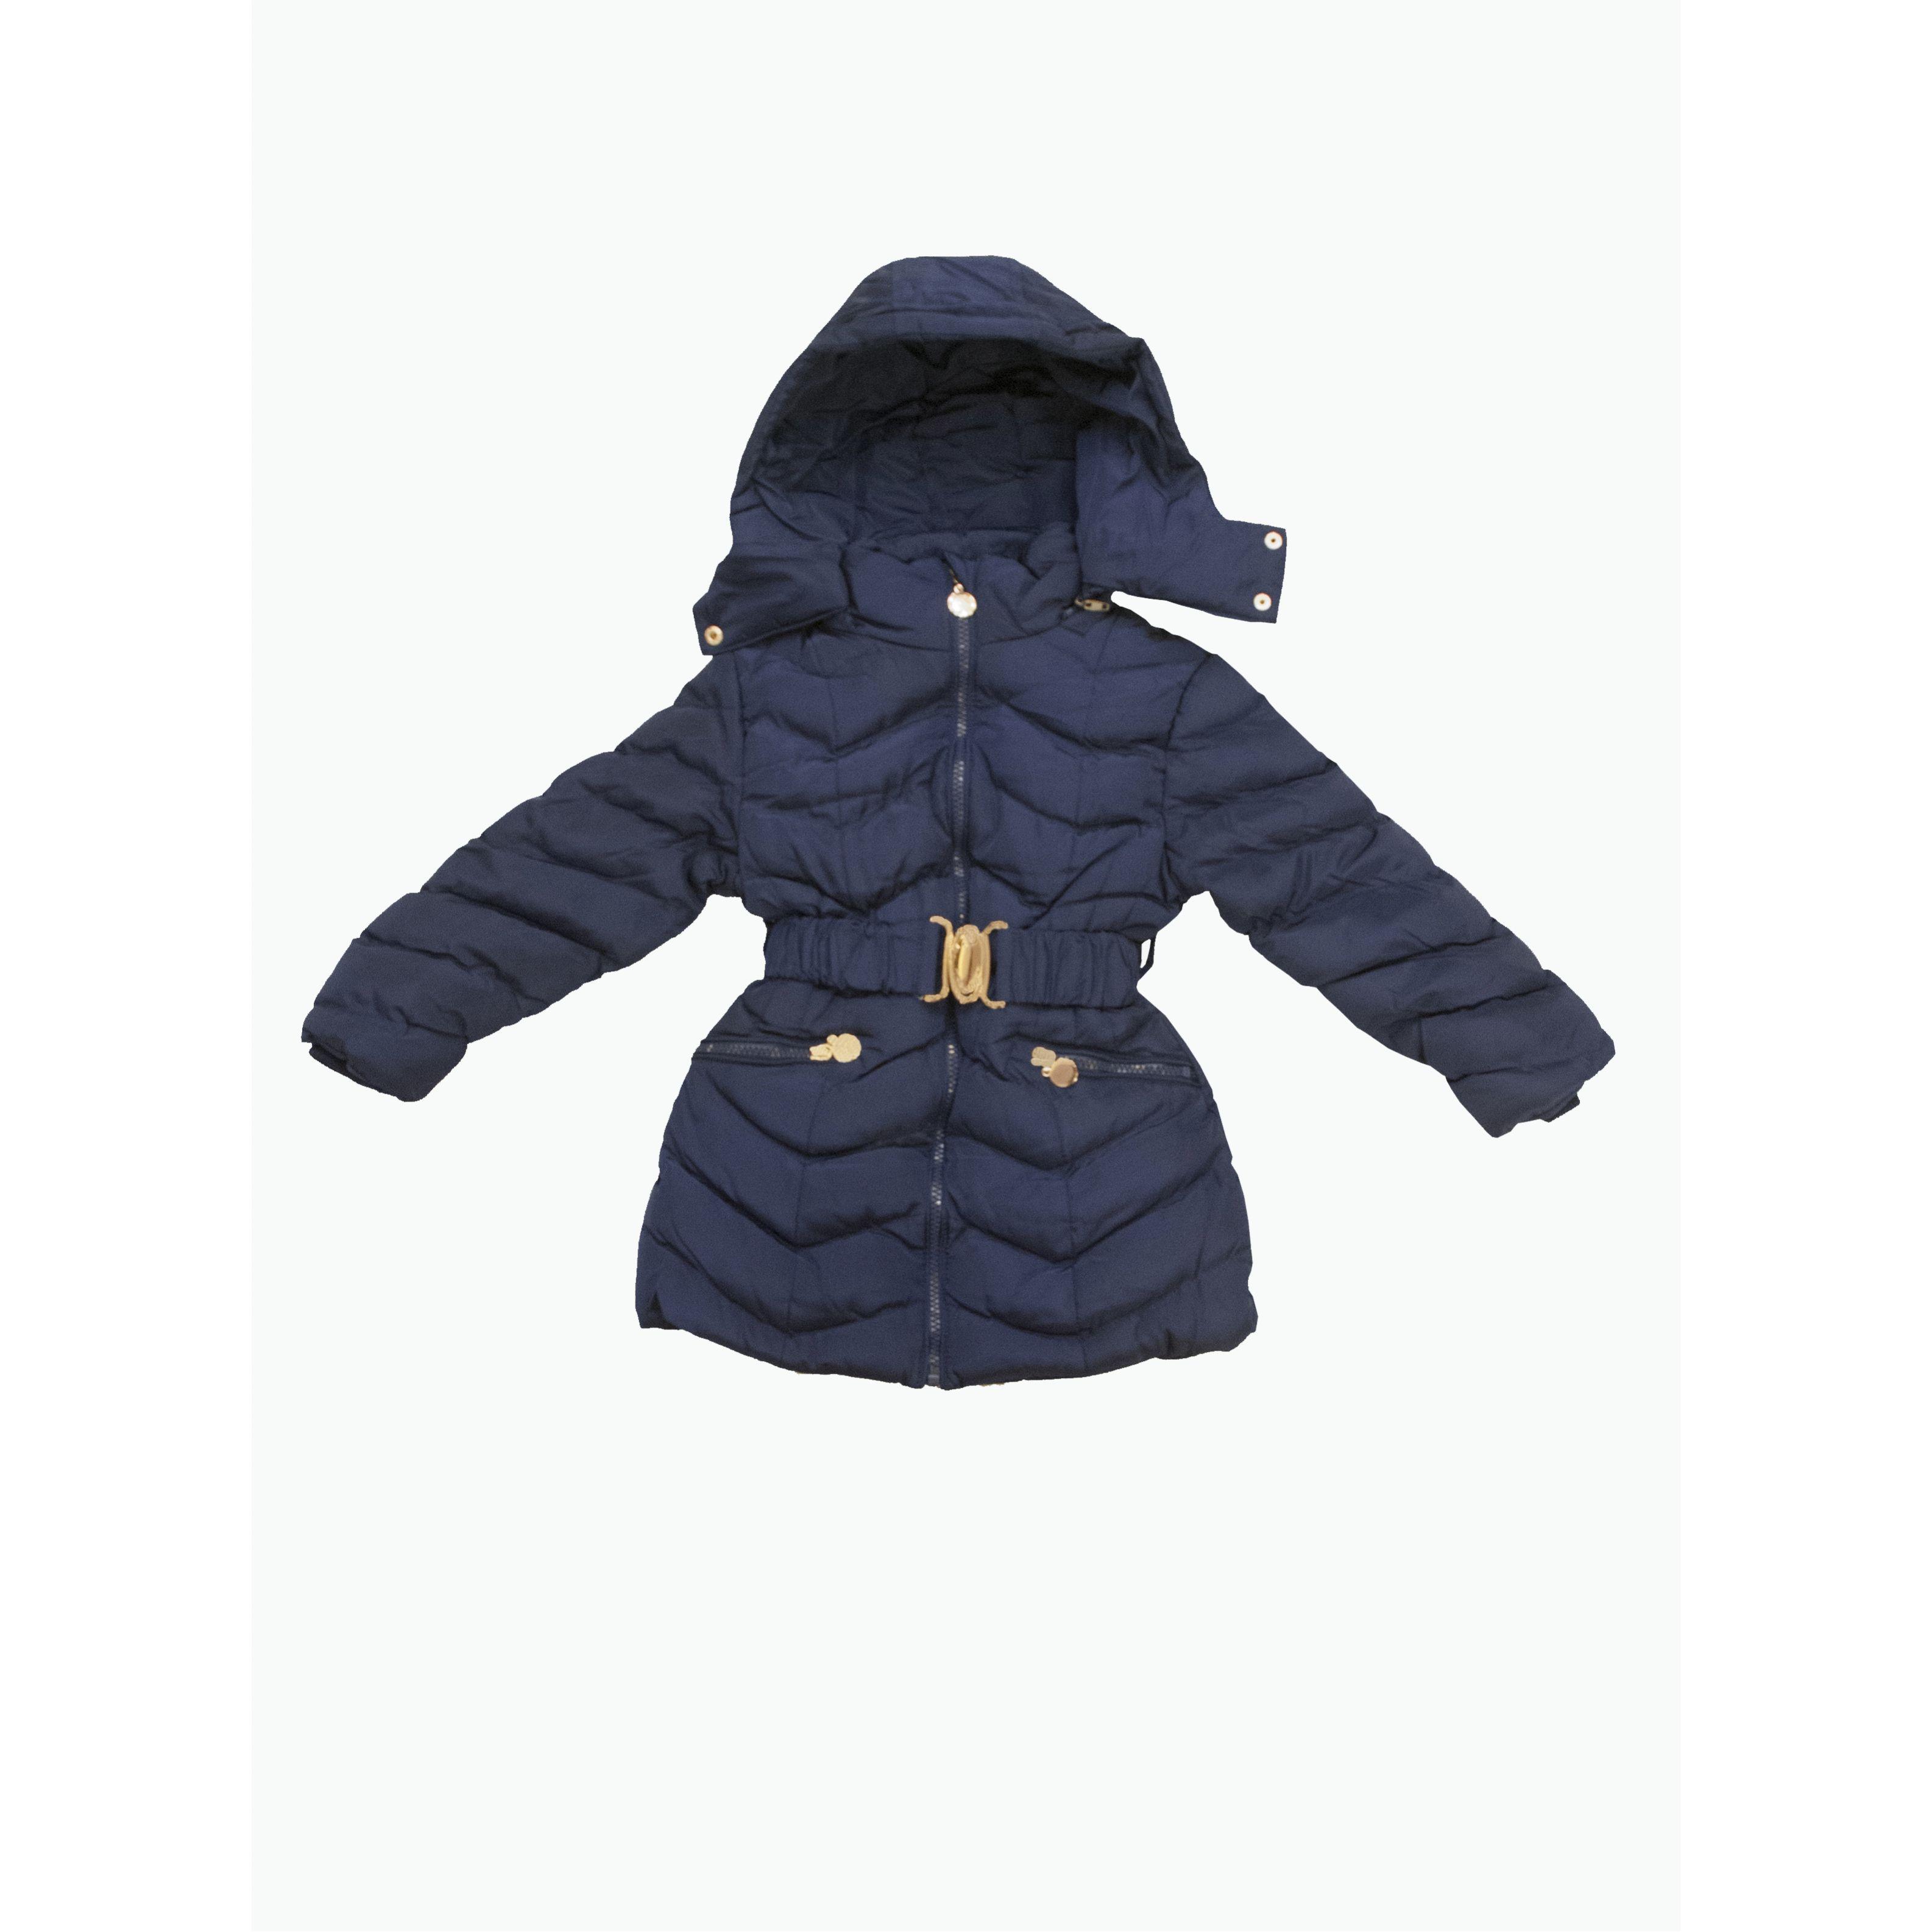 f482aa08ef2 Παιδικά ρούχα - Μπουφαν κορίτσι YF-3730 for only 25.00 !!!